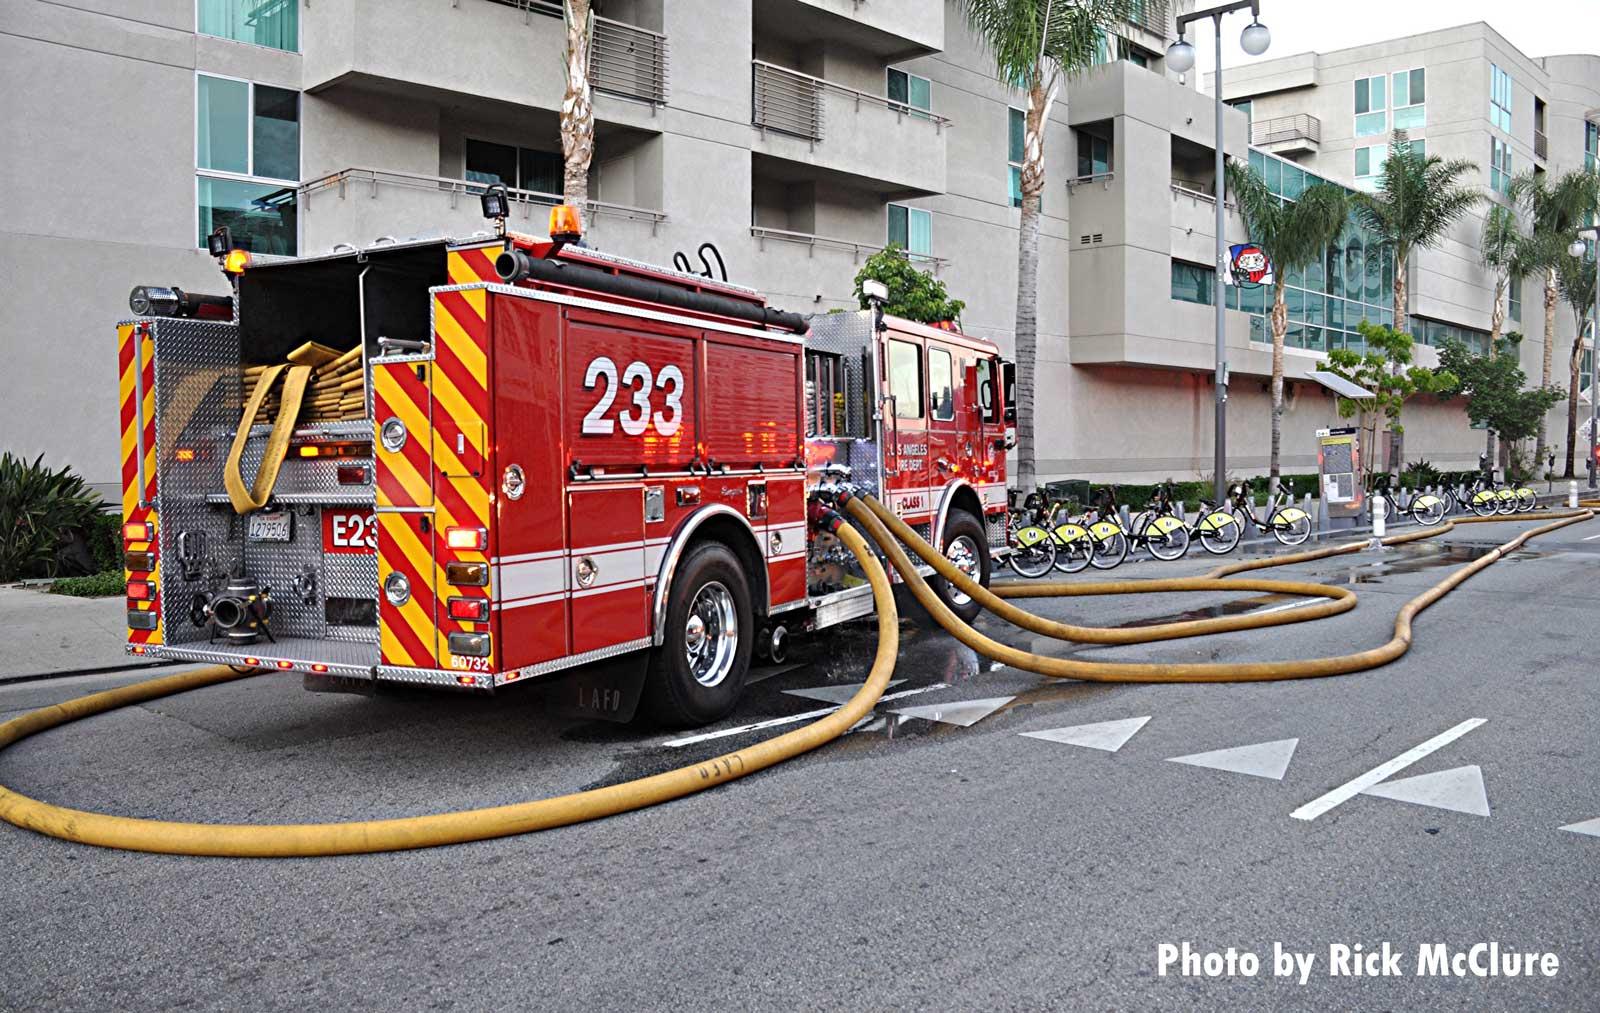 LAFD fire truck